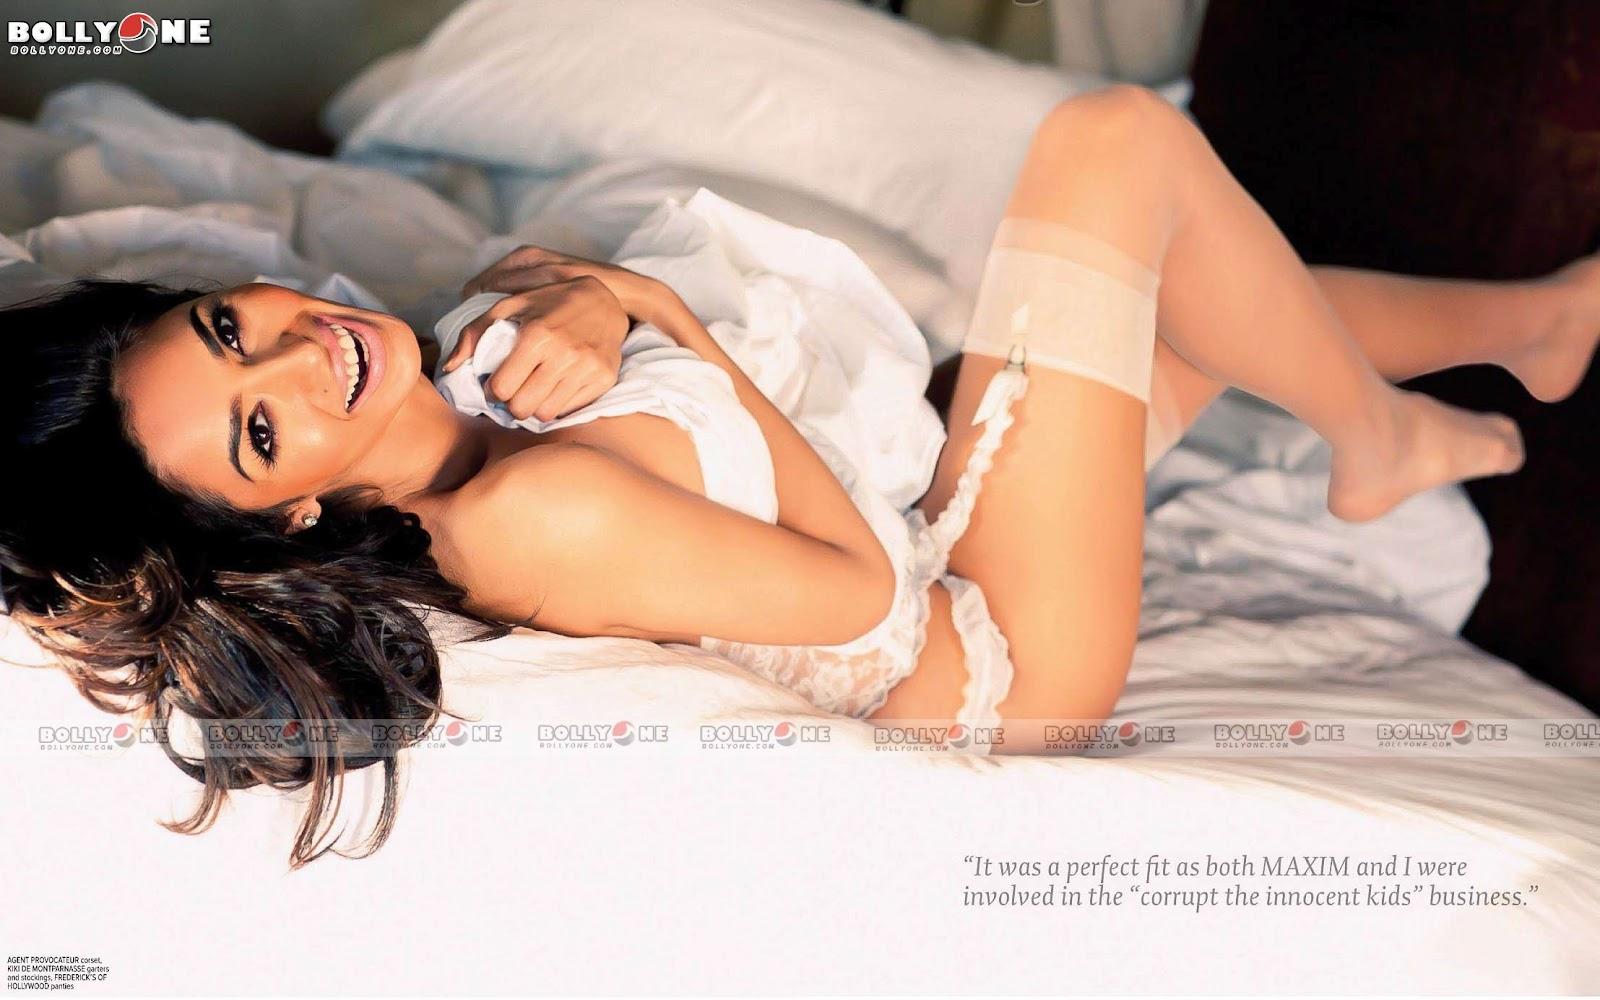 Remarkable mallika sherawat bikini pics in maxim have not